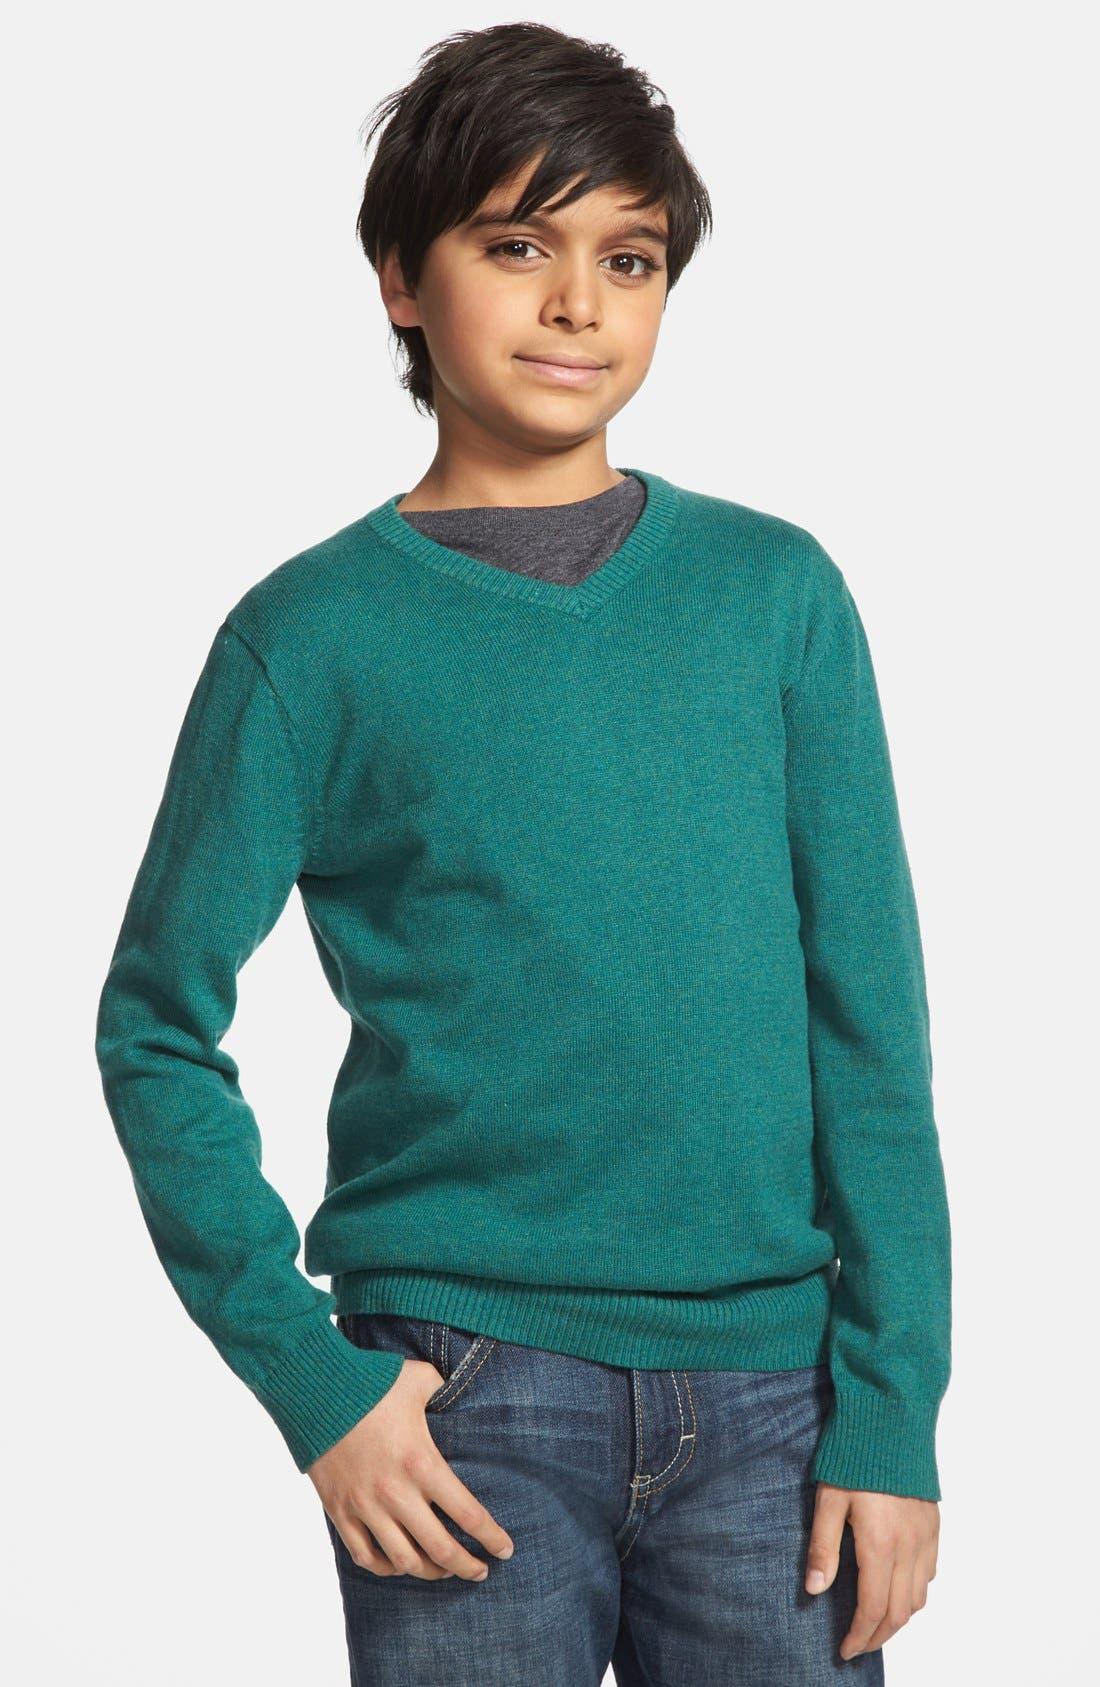 Alternate Image 1 Selected - Tucker + Tate 'Atticus' Cotton & Cashmere Sweater (Big Boys)